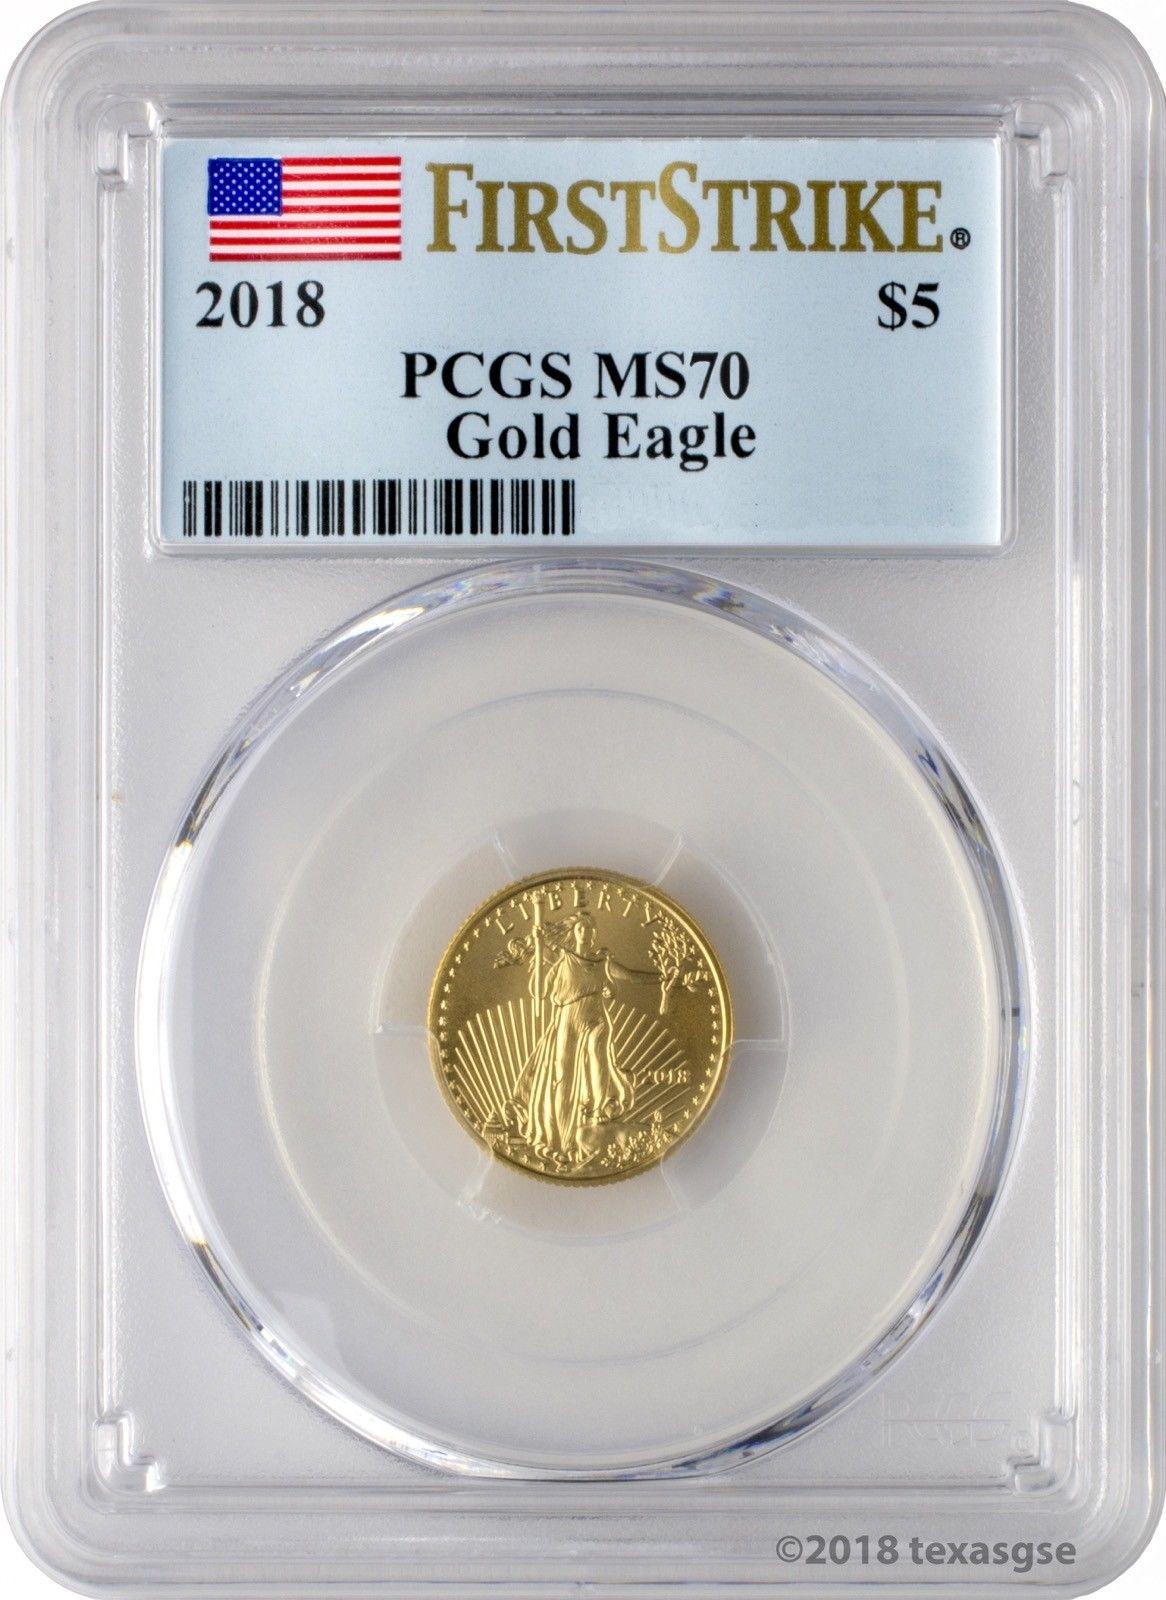 Купить 2018 $5 Gold Eagle PCGS MS70 First Strike - Blue Flag Label